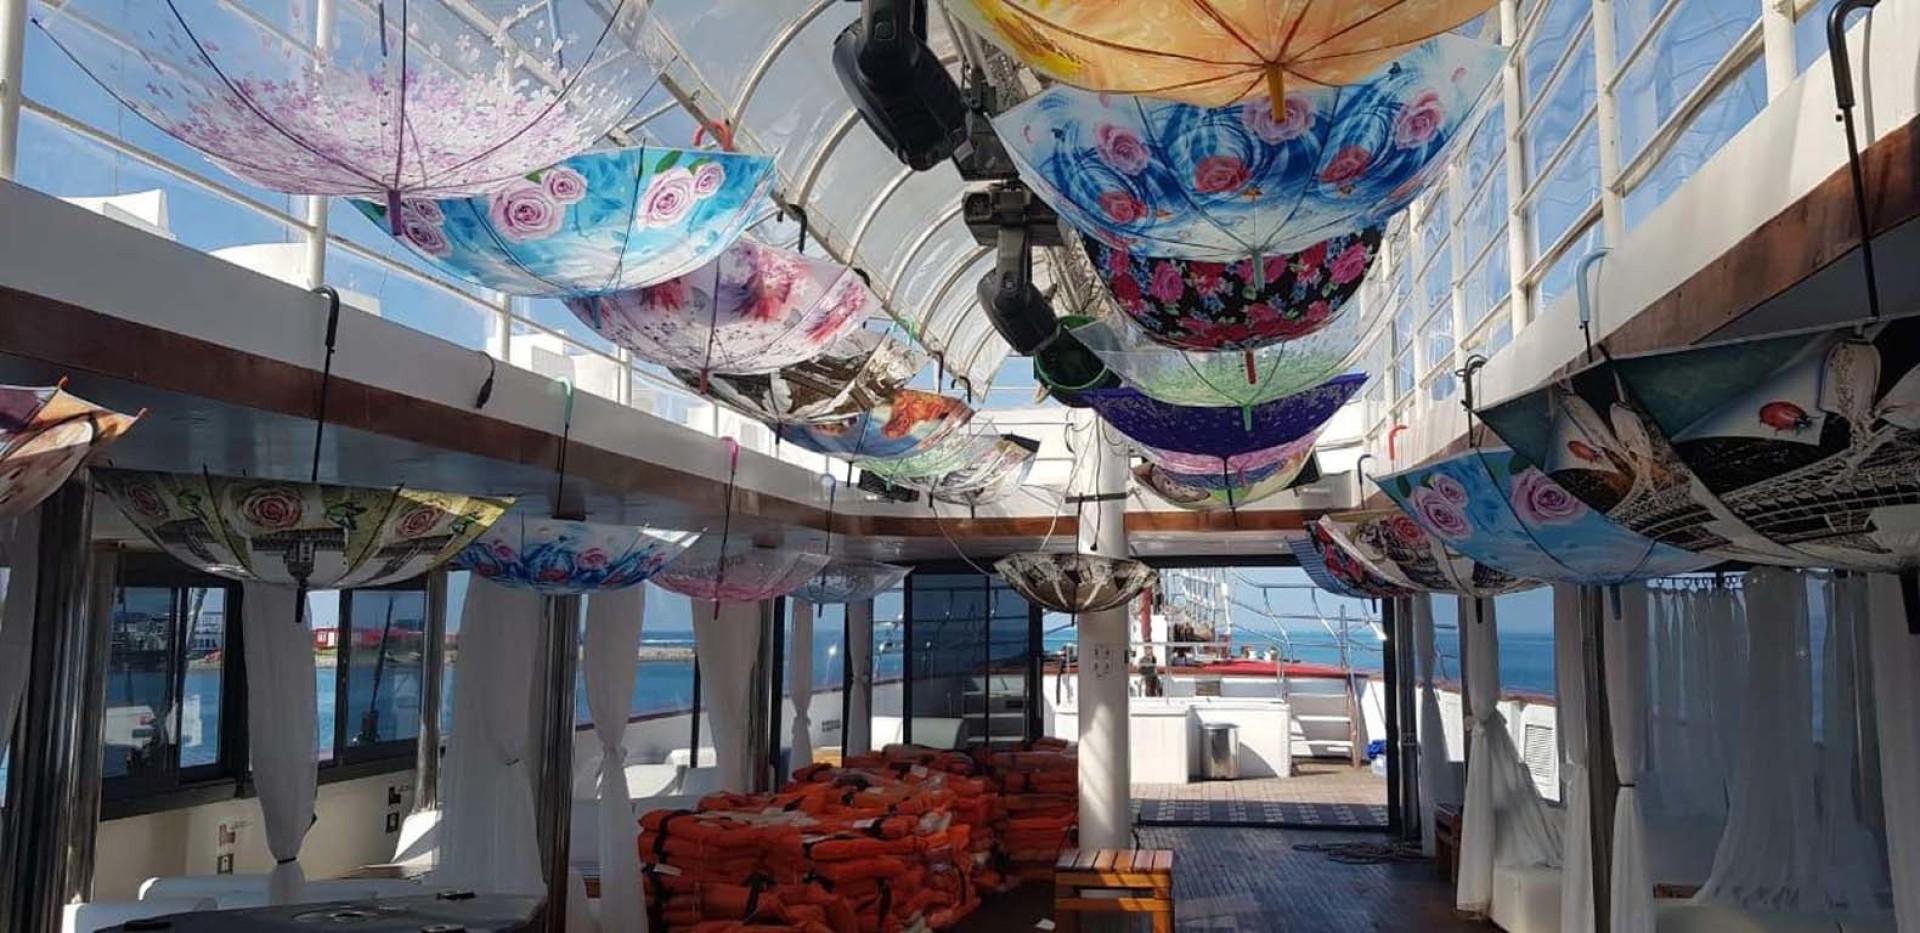 Custom-LZ-140 2009-My Dream Batumi-Georgia-Passenger Deck  Inside Roof-1447624 | Thumbnail